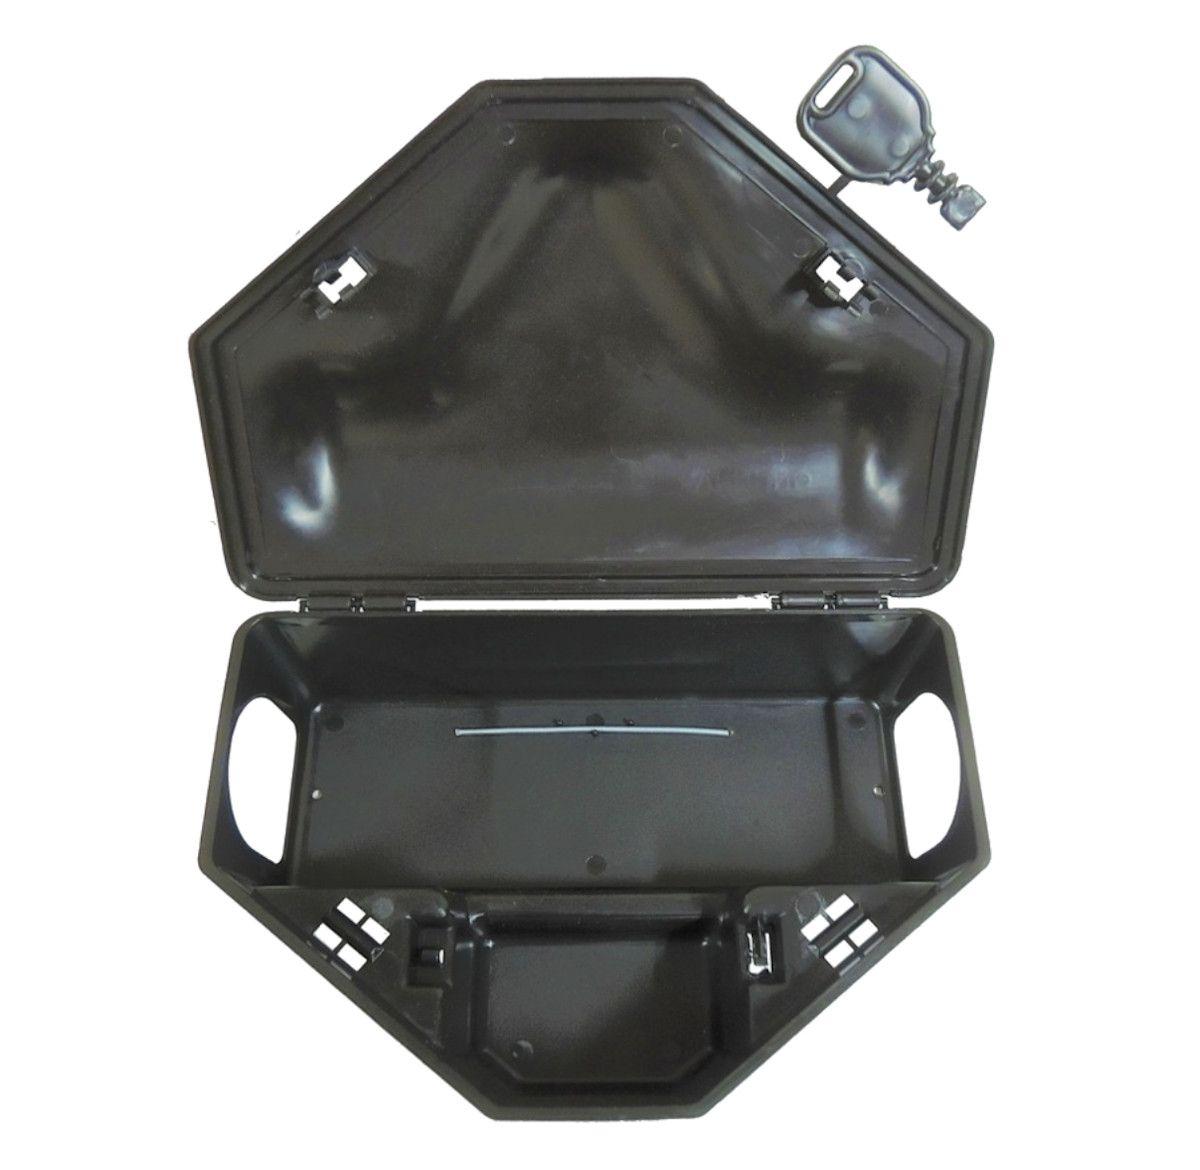 Kit 64 Porta Isca C/2 Chaves + 64 Bloco Extrusado Mata Seca